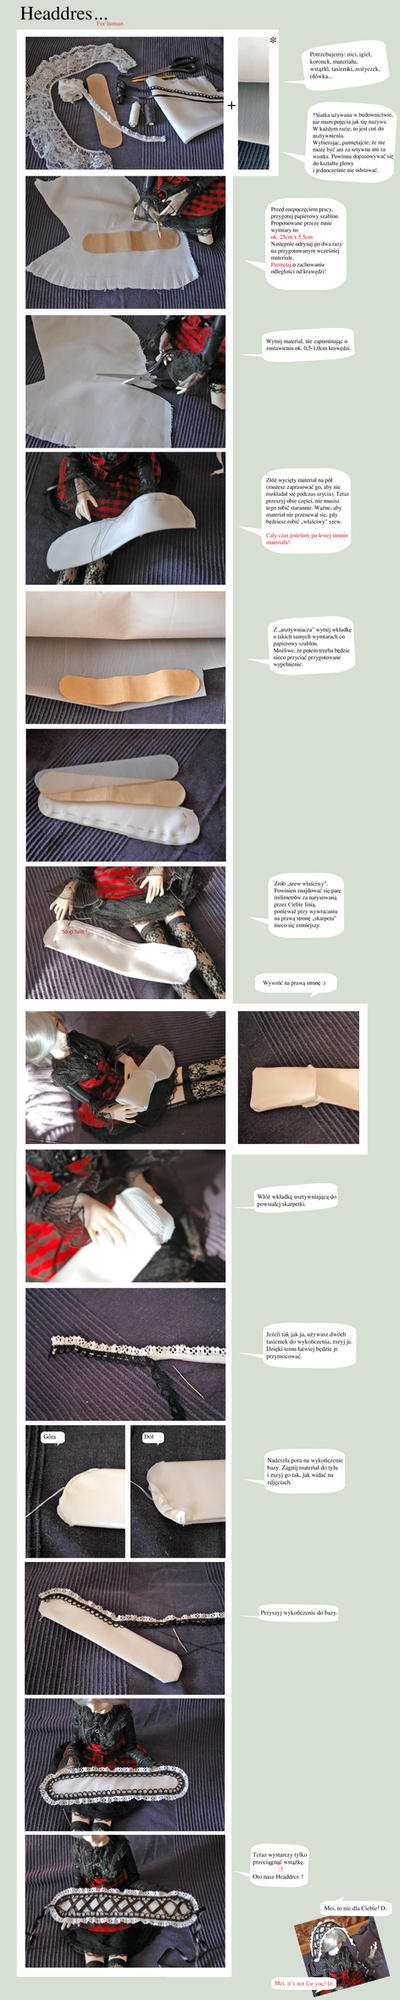 Headdress tutorial by Neriko-k